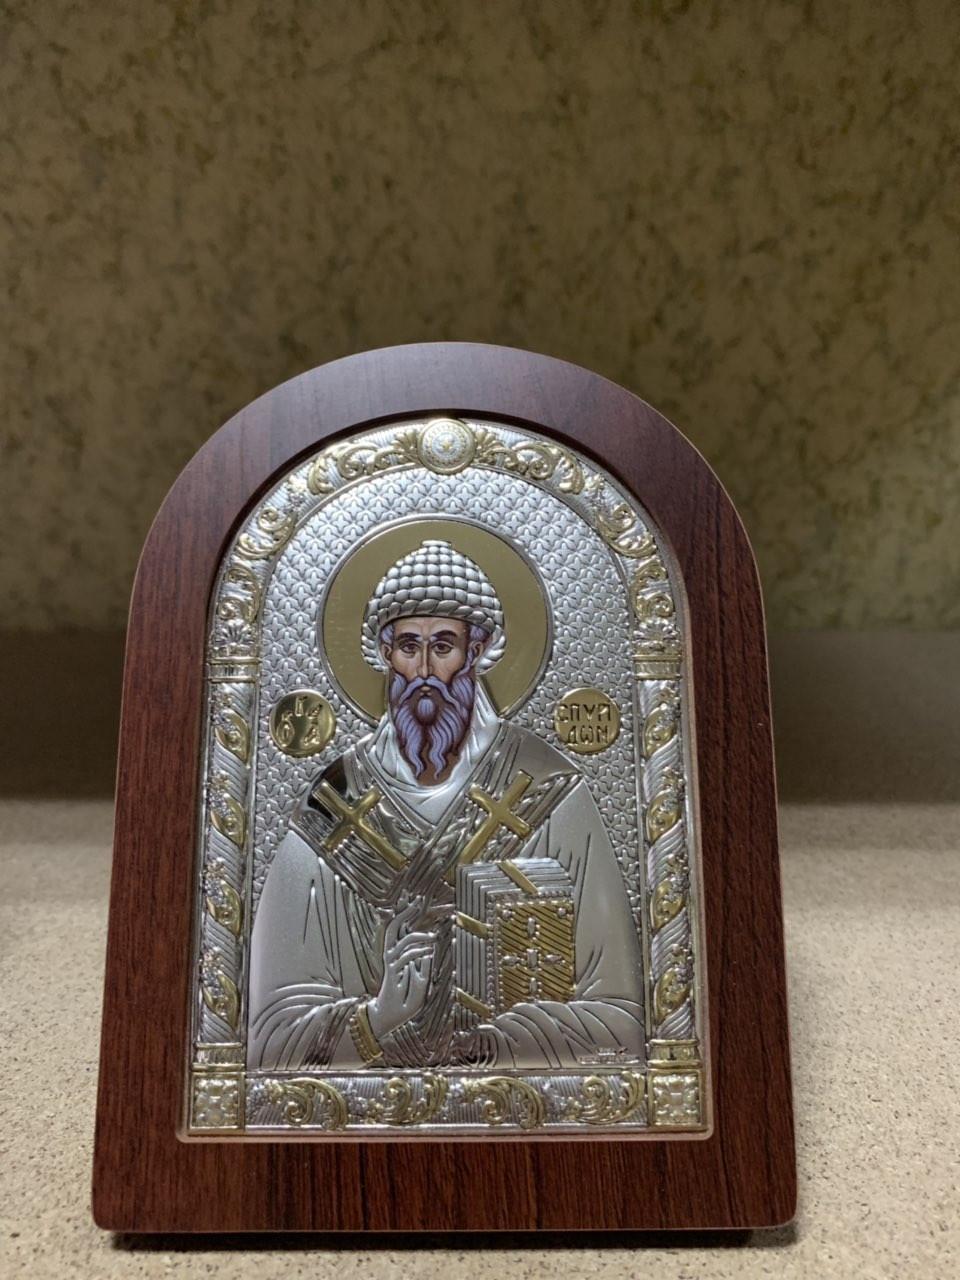 Икона Святой Спиридон AGIO SILVER (Греция) Серебряная с позолотой 120 х 160 мм